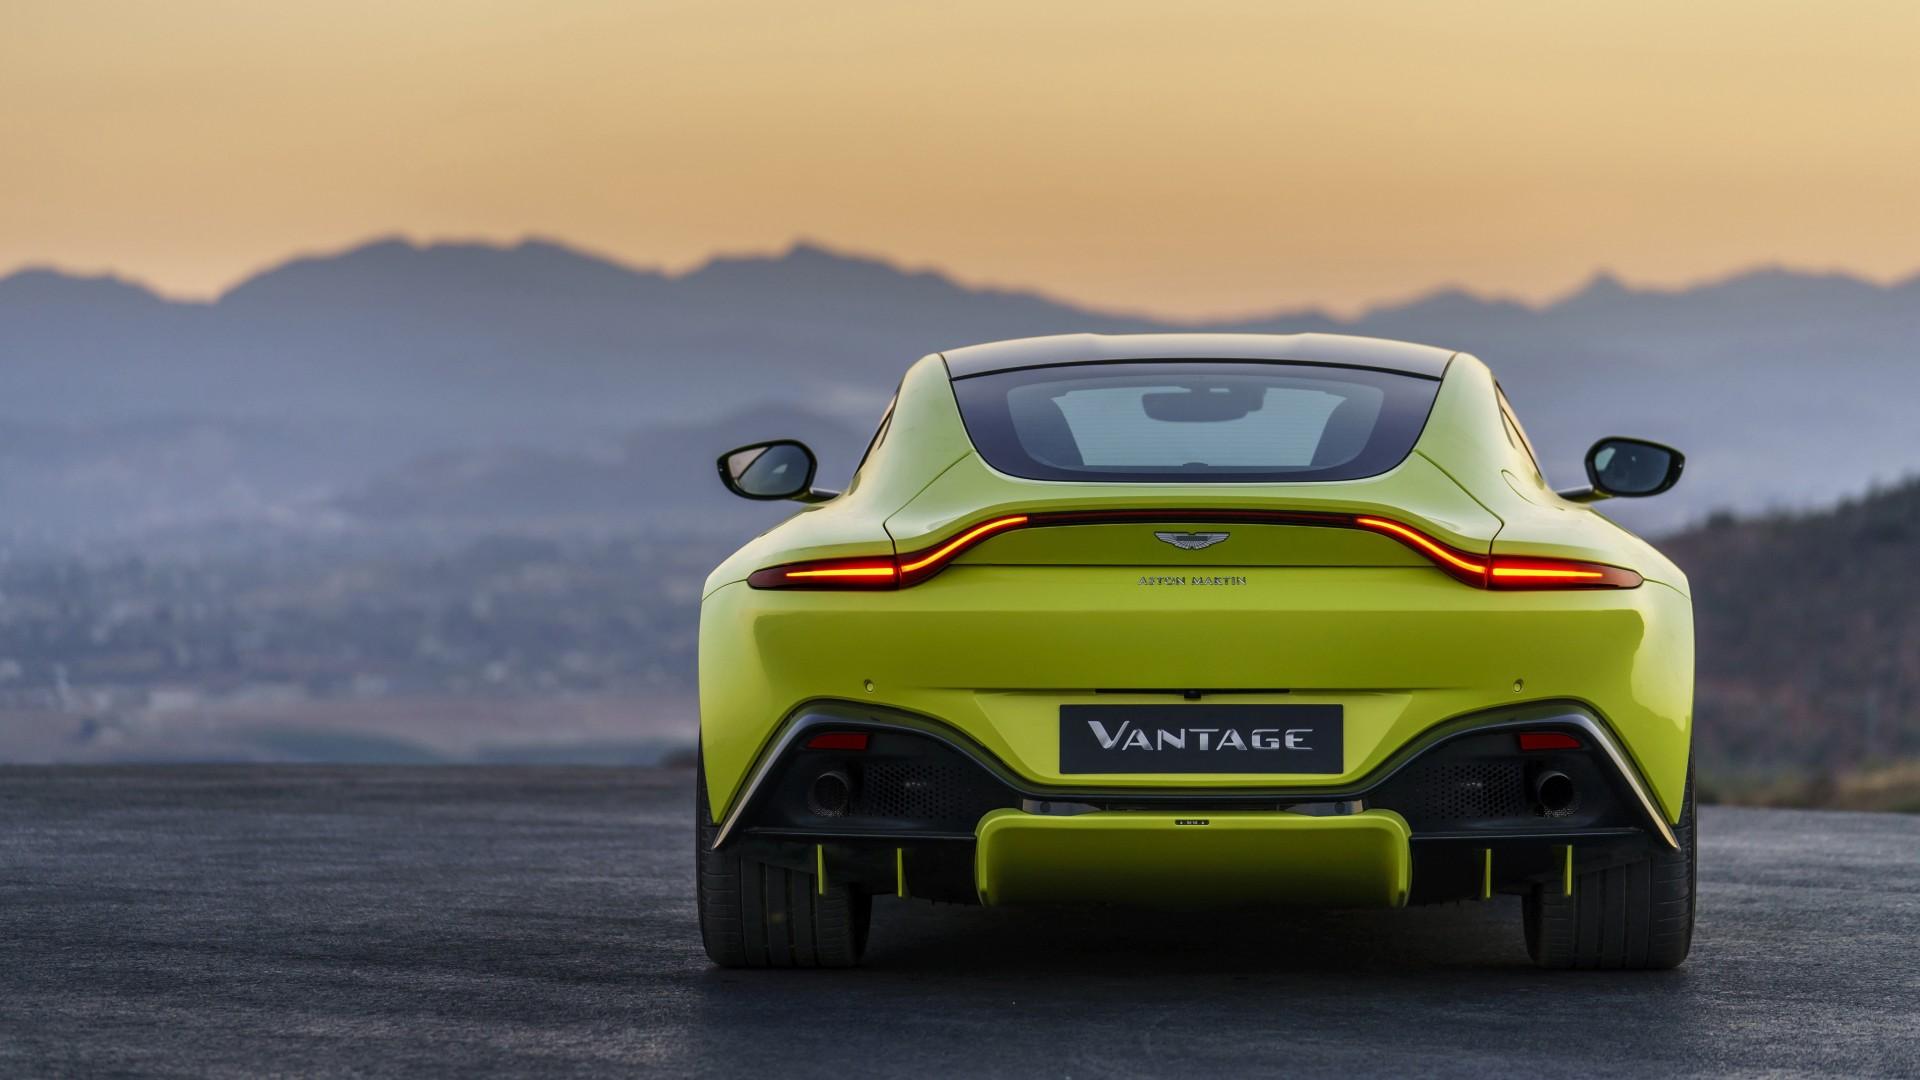 2018 Aston Martin Vantage 4K 6 Wallpaper HD Car